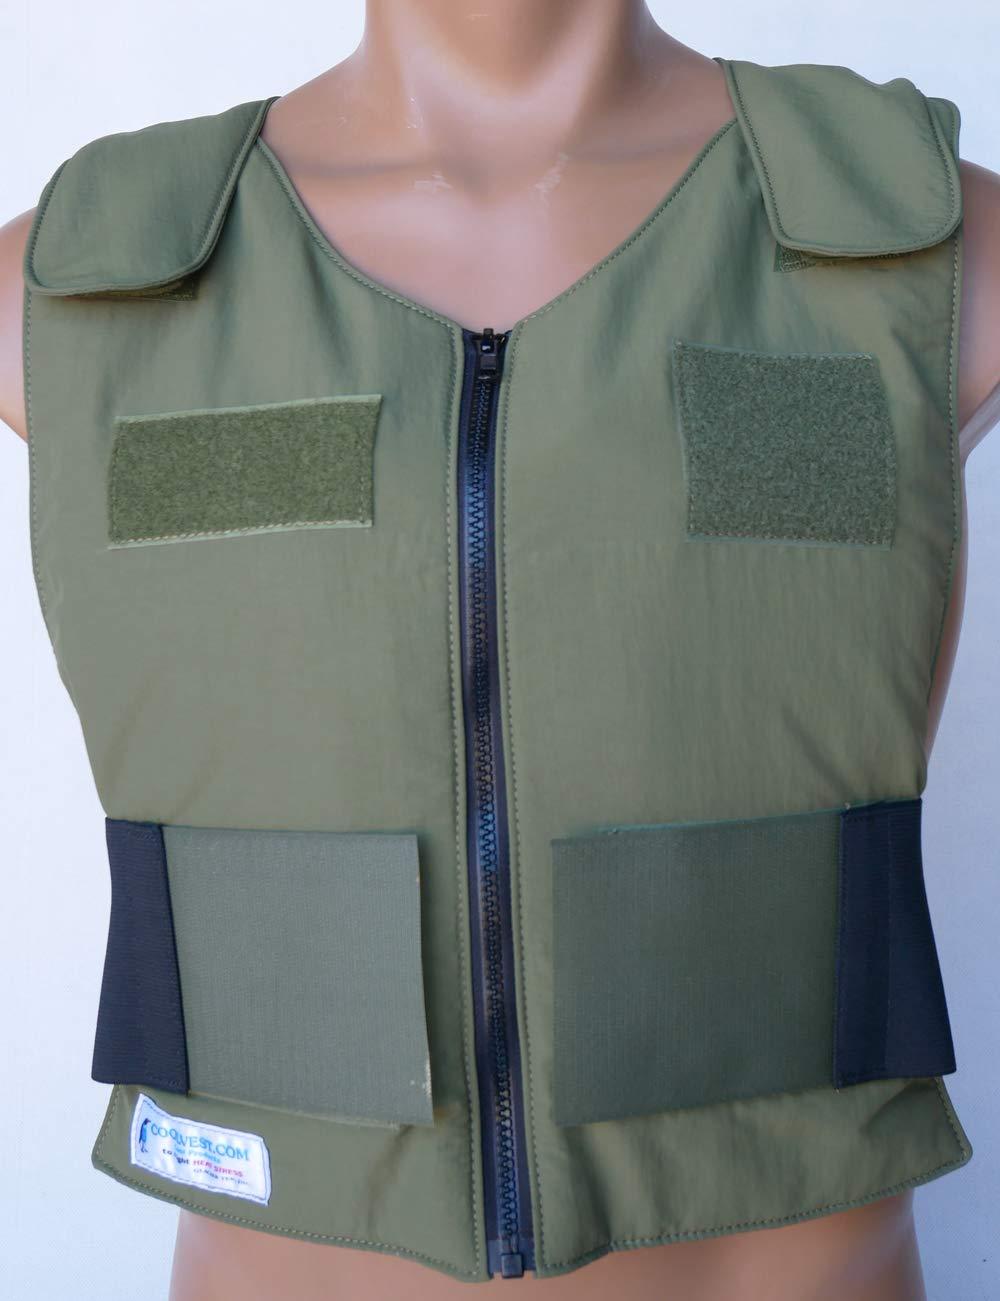 Glacier Tek Law Enforcement Cool Vest with Set of 8 Nontoxic Cooling Packs Green